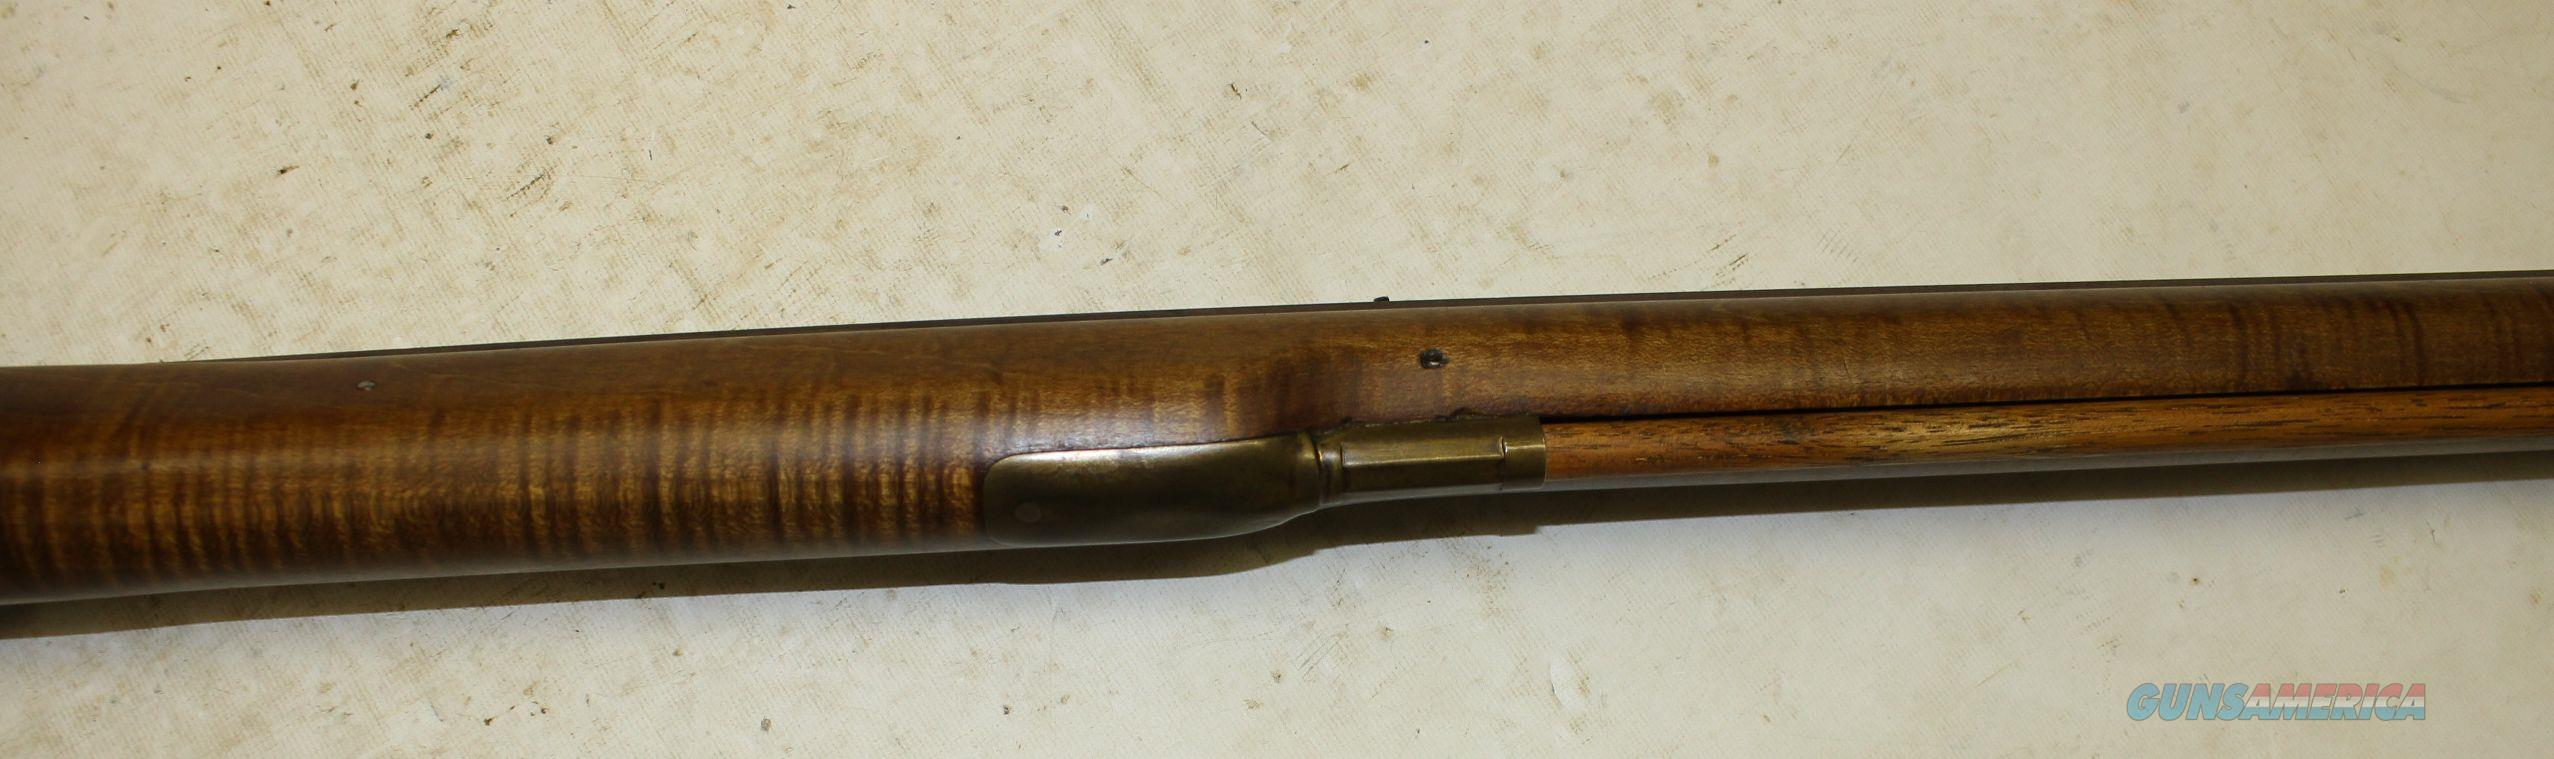 36 Caliber Black Powder Rifle